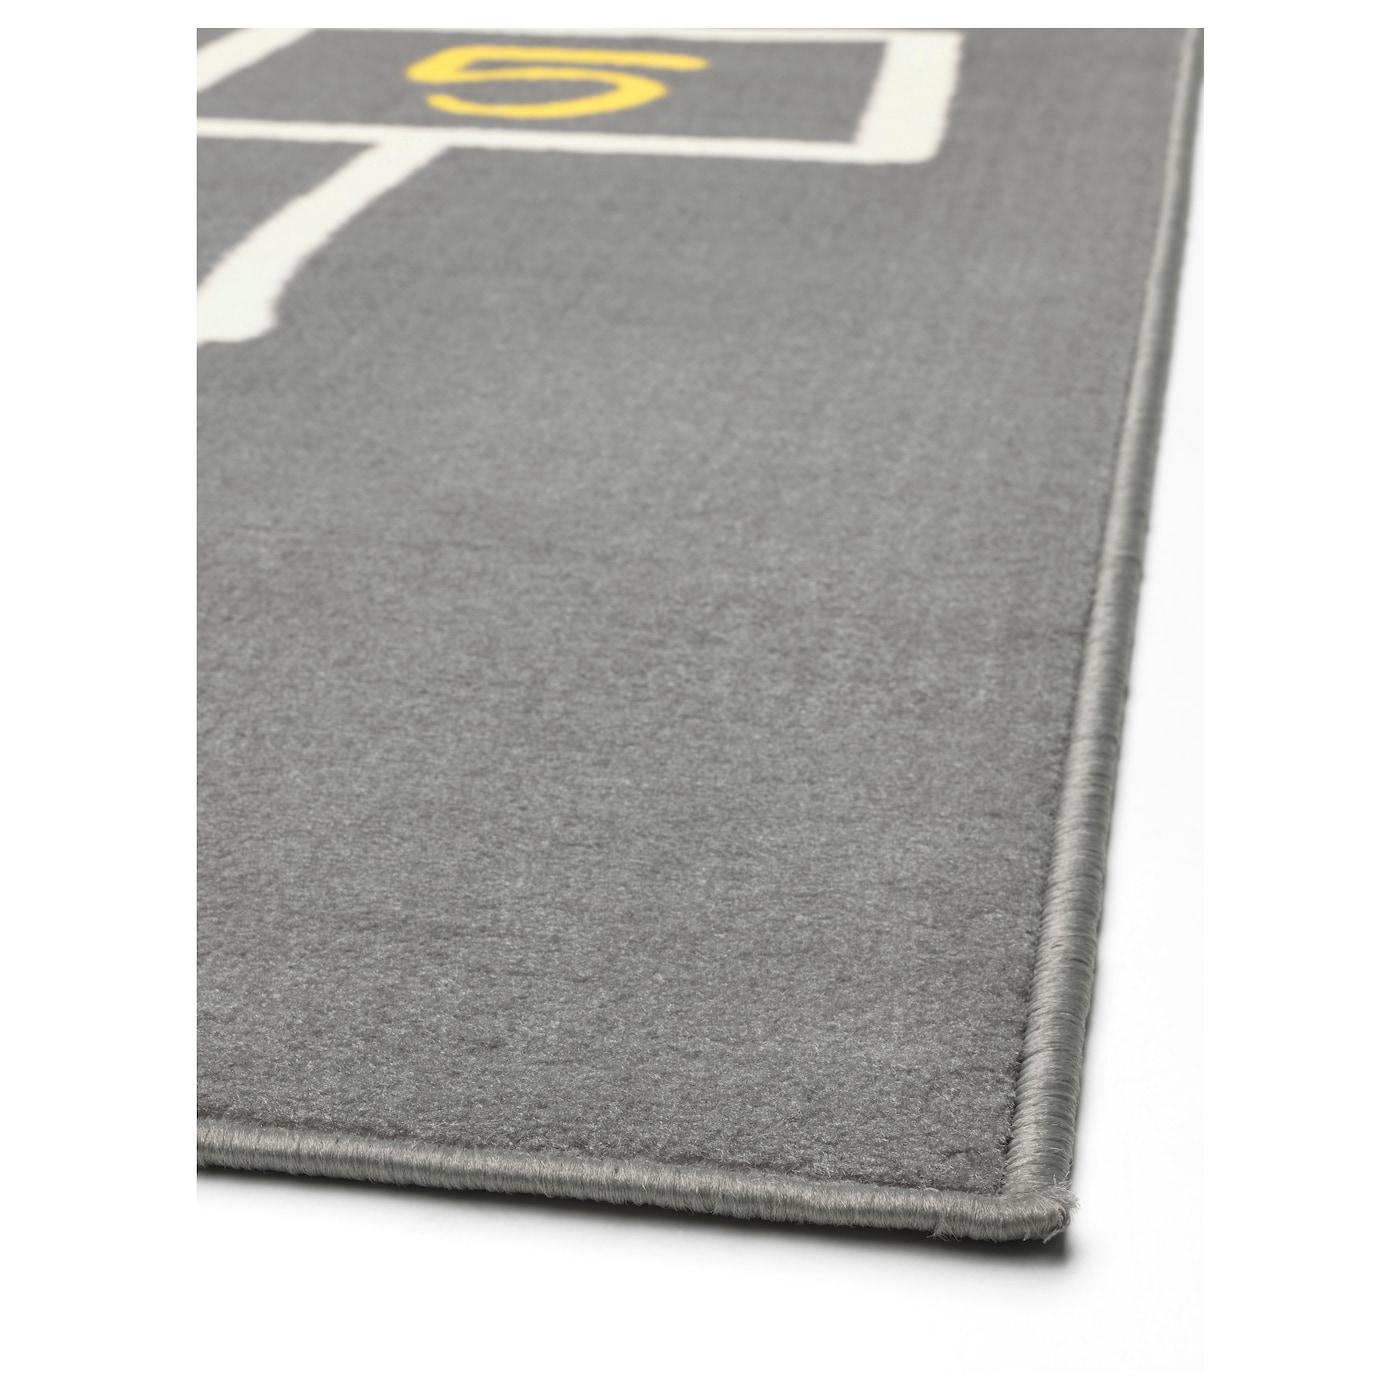 hemmahos vloerkleed grijs 100x160 cm ikea. Black Bedroom Furniture Sets. Home Design Ideas